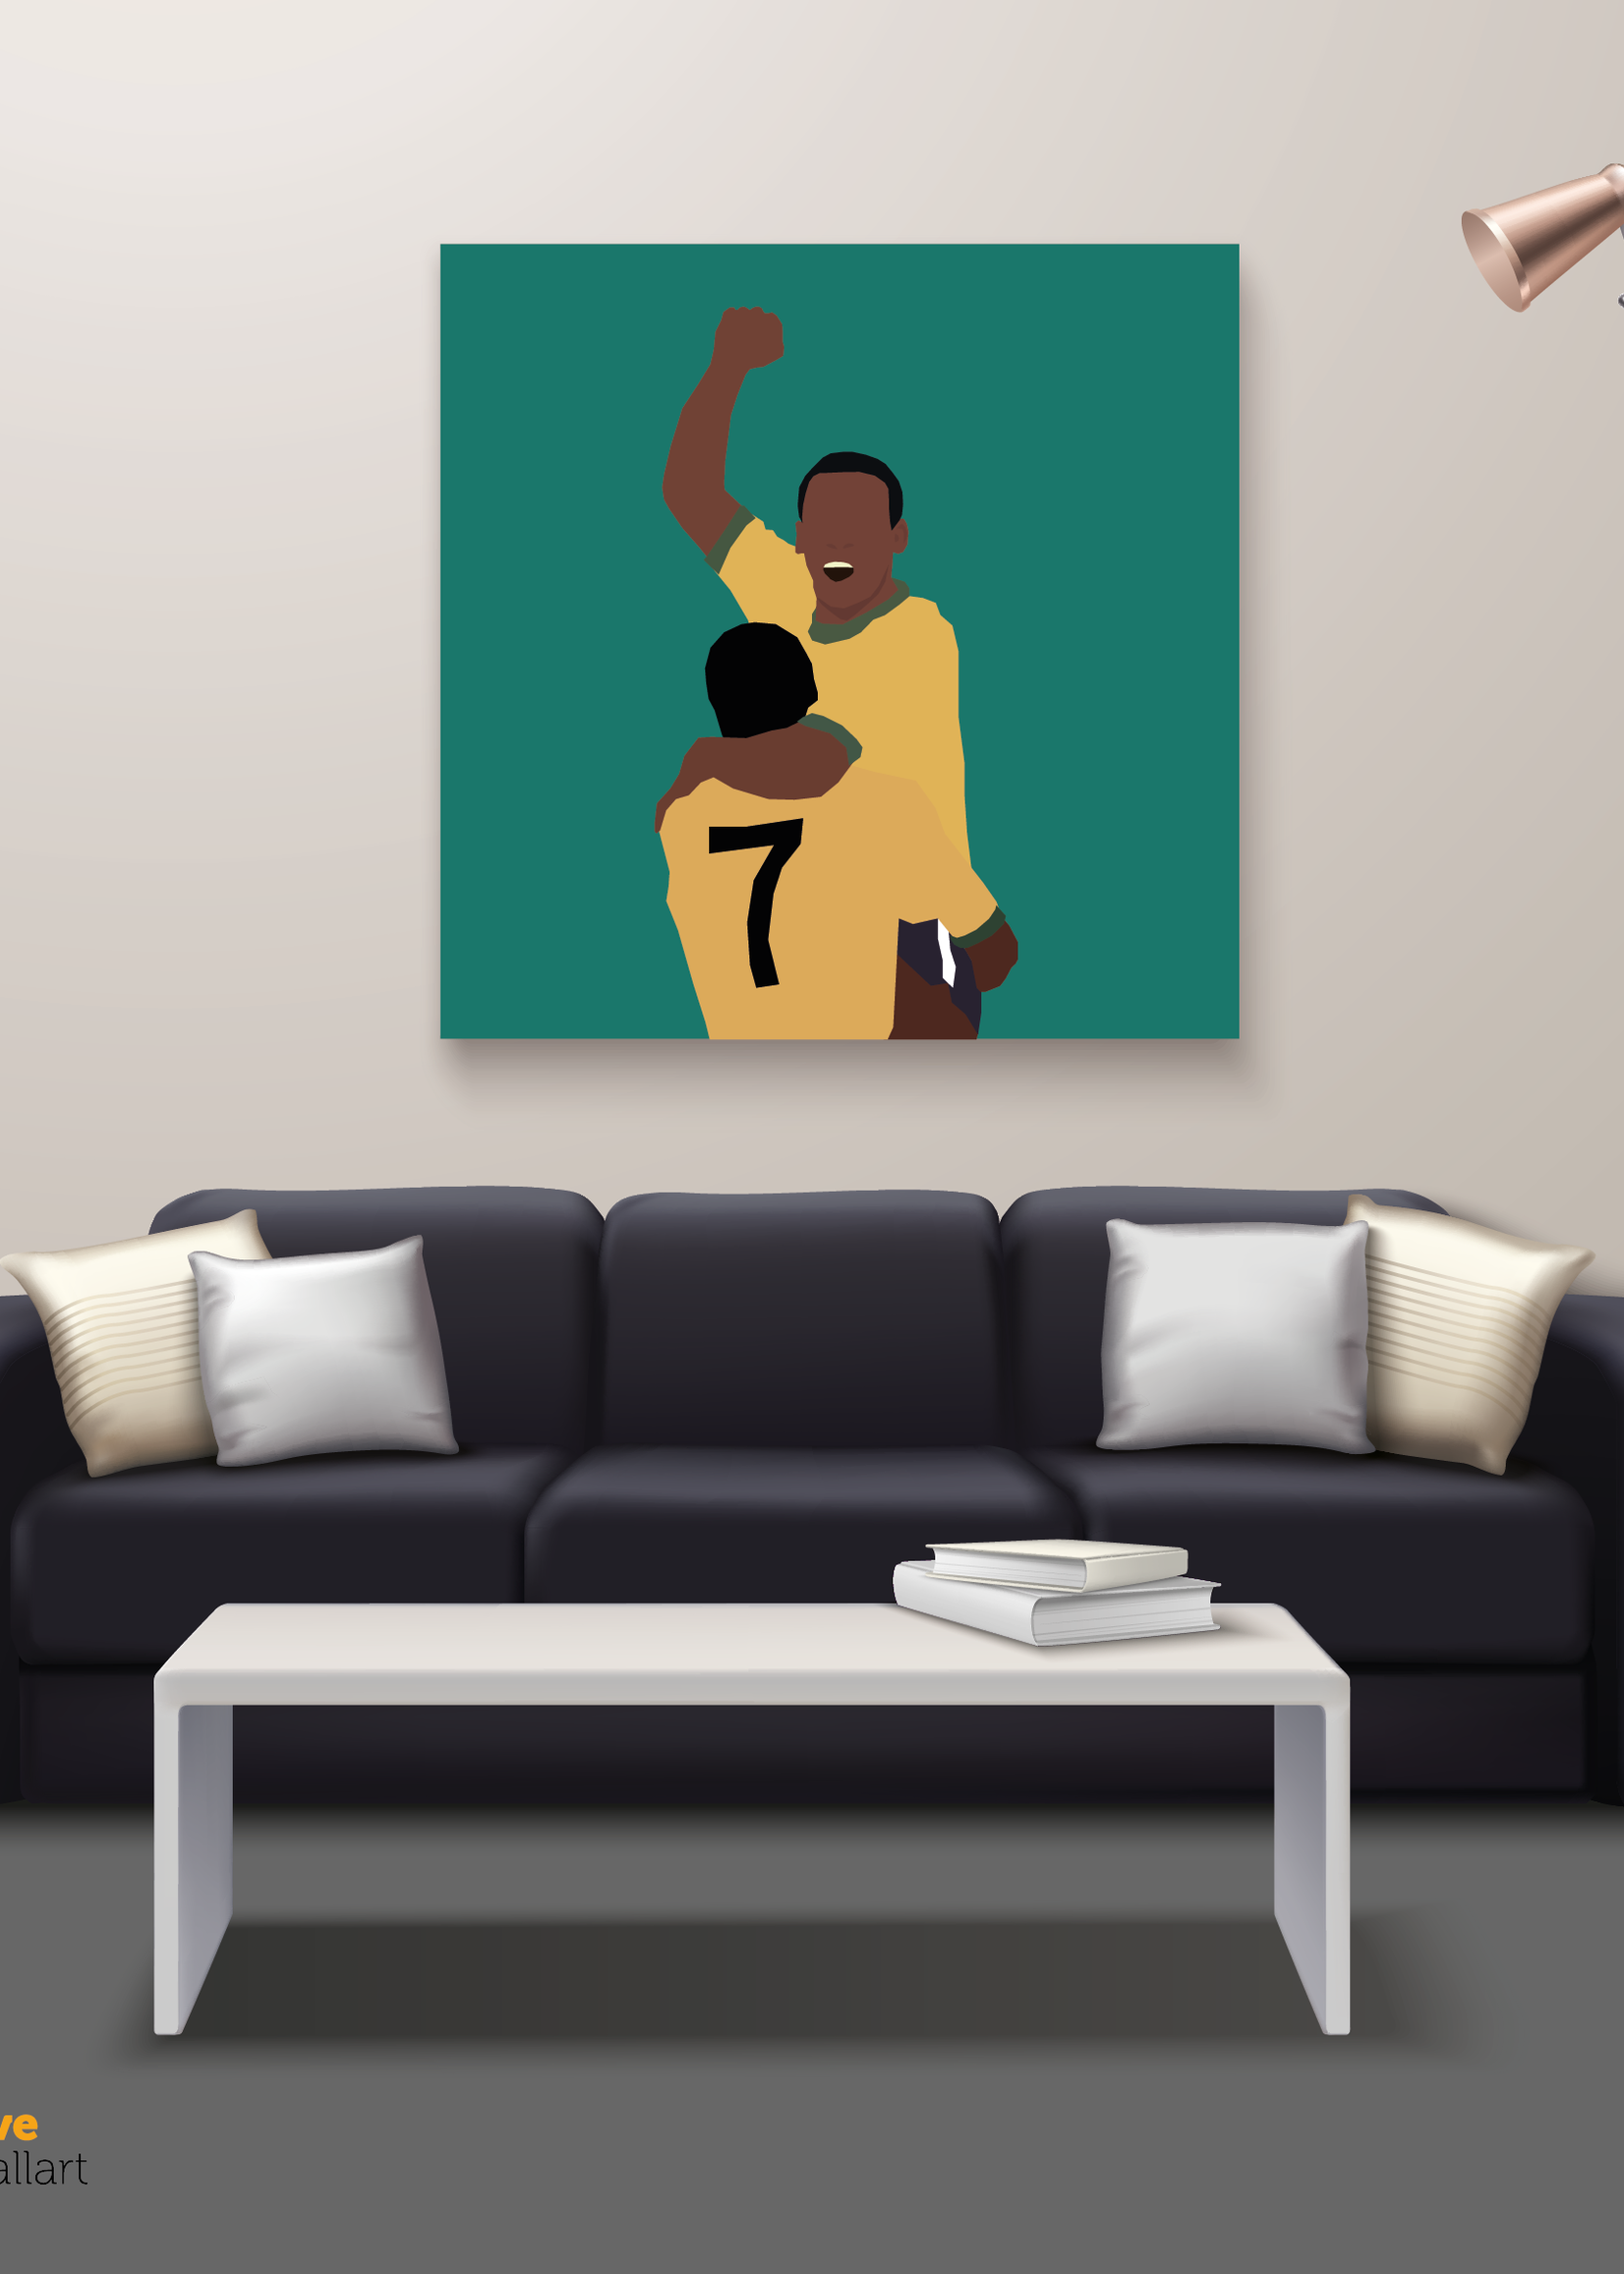 "We Love Football Art ""Perla Negra"" We Love Football Art"